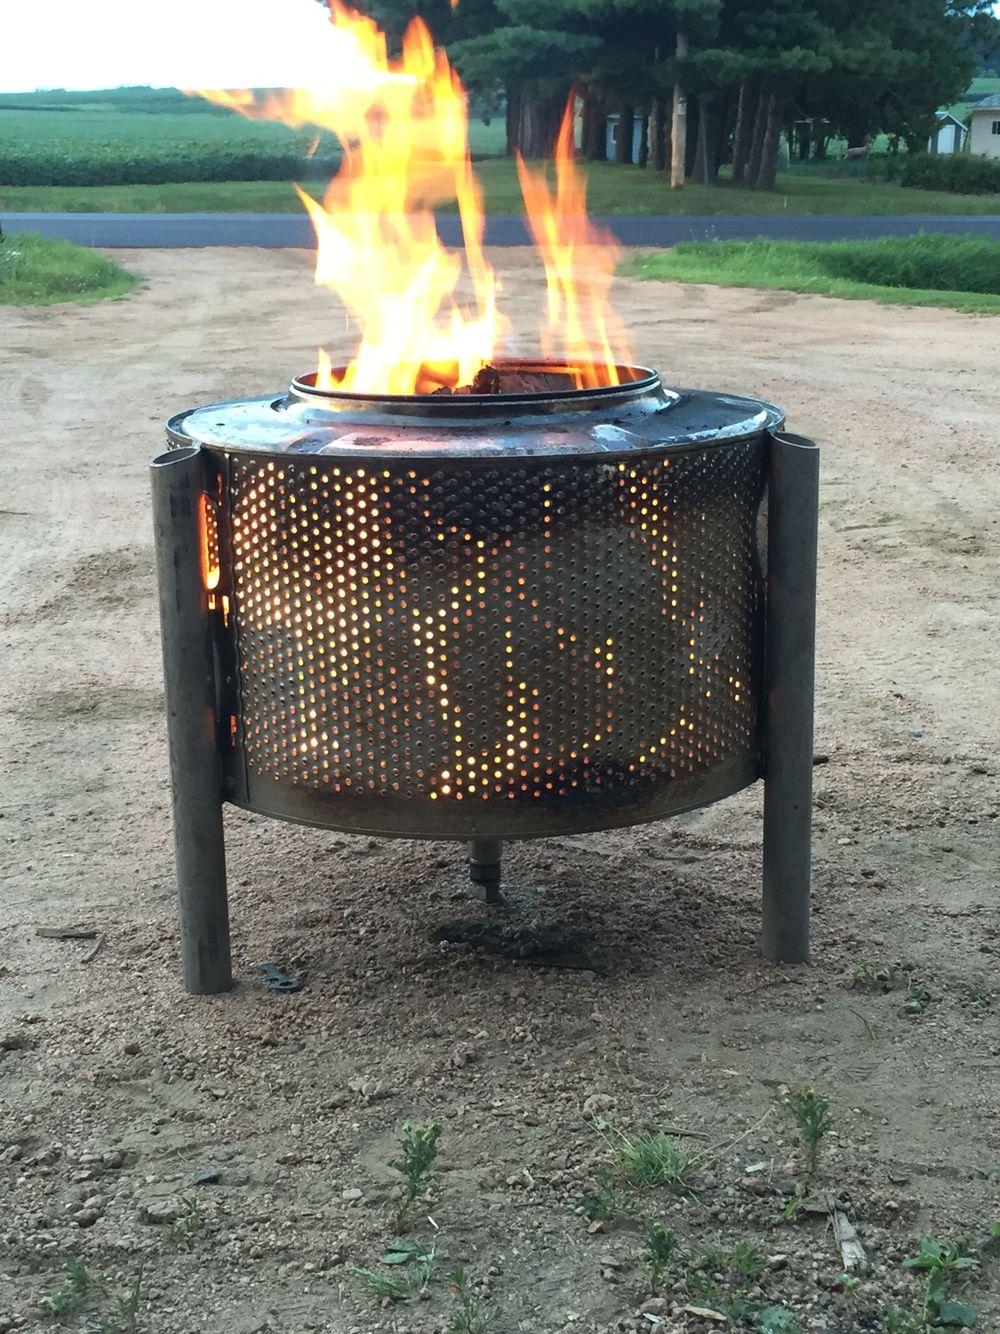 Washing machine drum fire pit - Washing Machine Drum Fire Pit 1壁爐 Pinterest Fire Pit